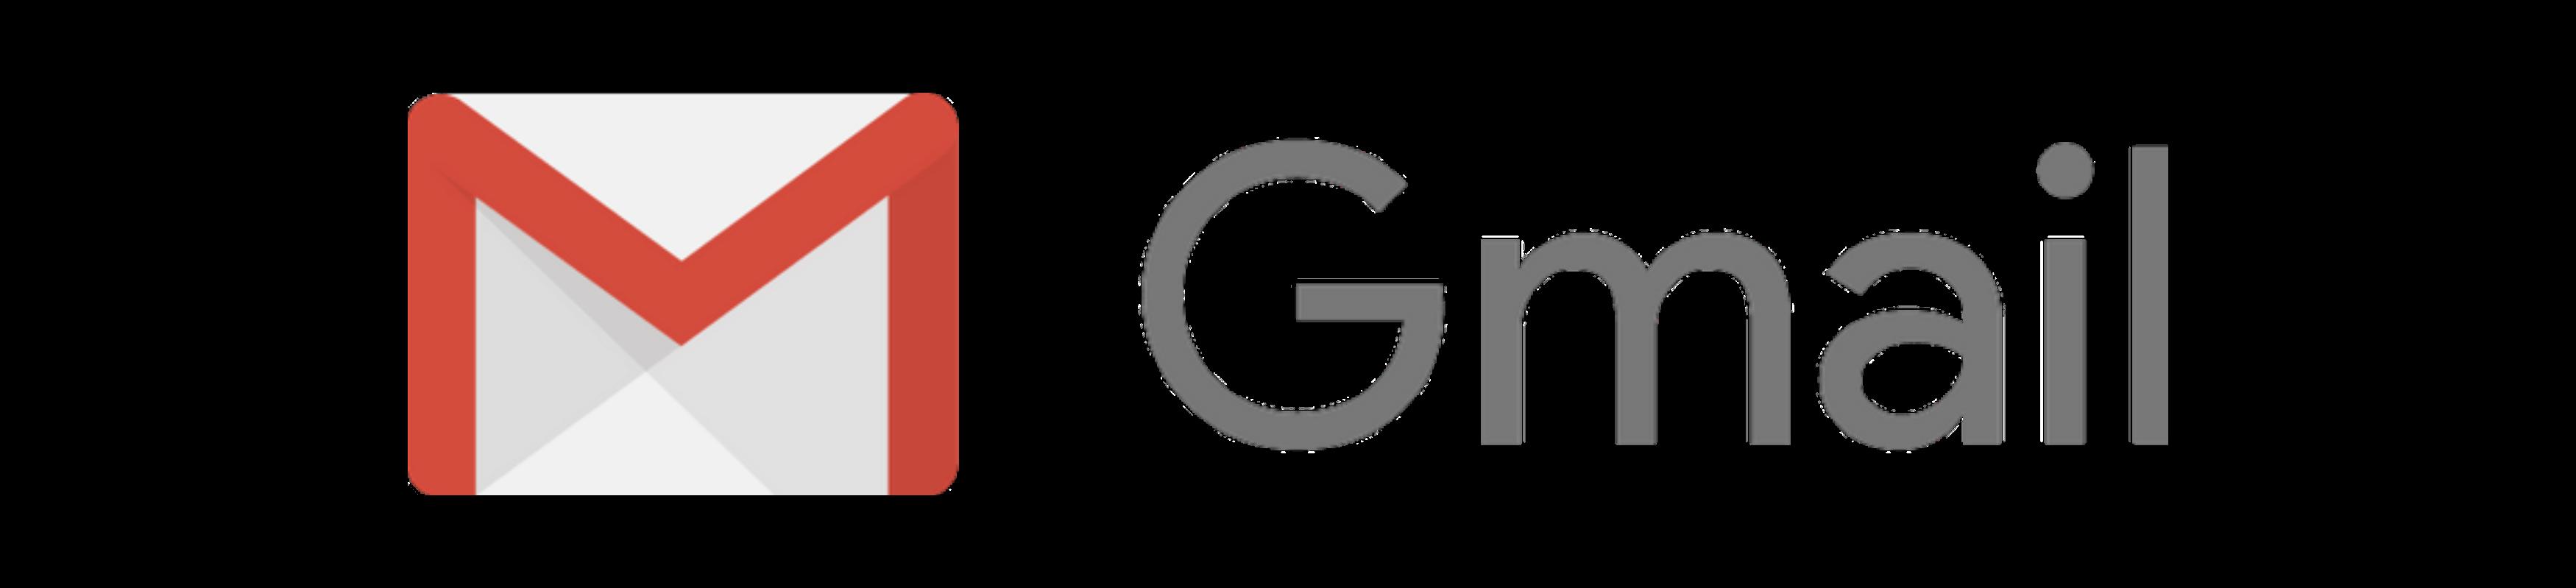 gmail-followup-crm-integration